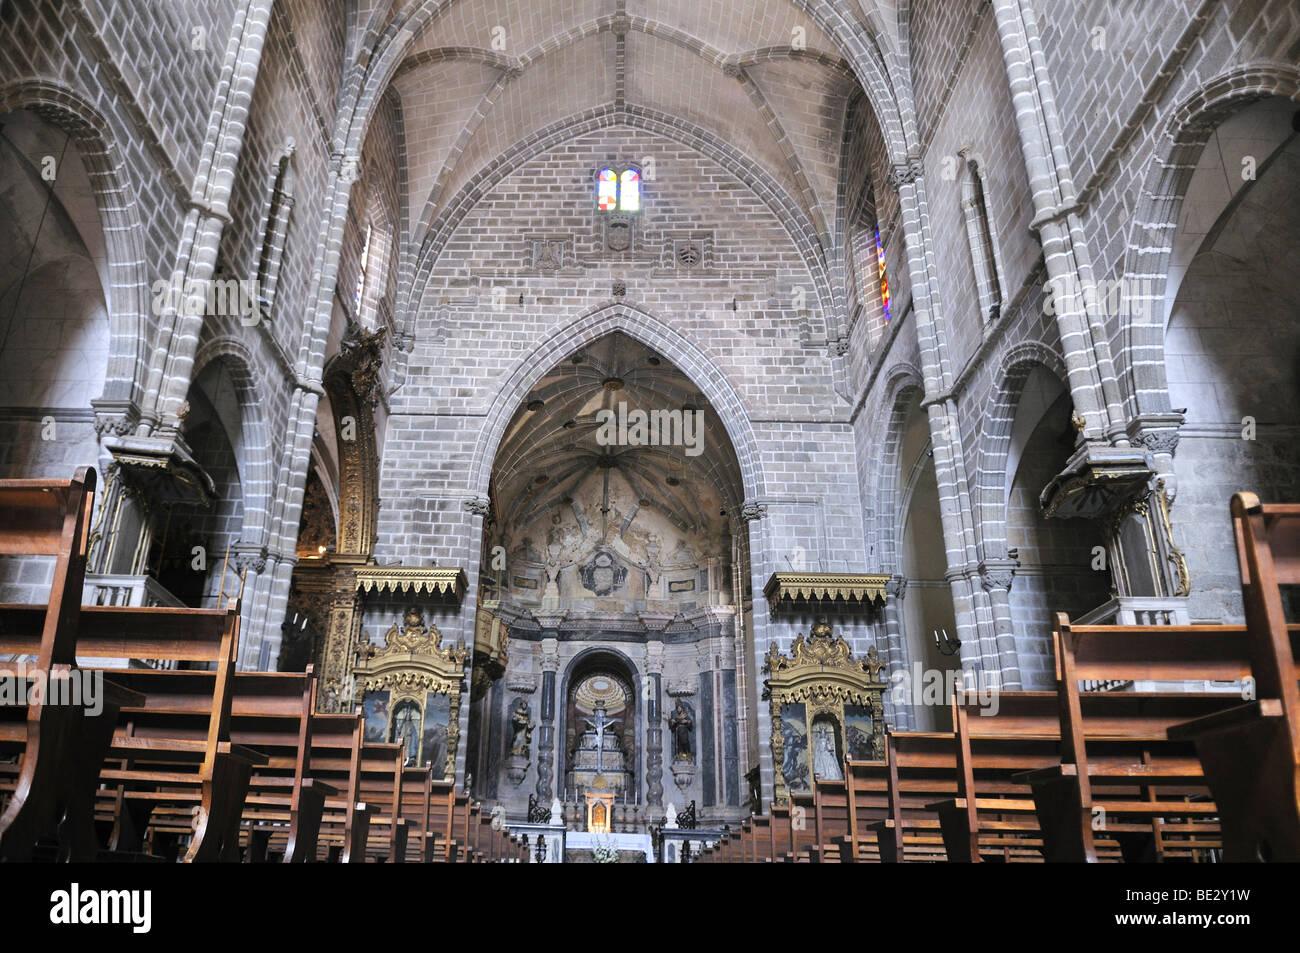 Gothic Style Interior interior of the igreja de sao francisco church, gothic style